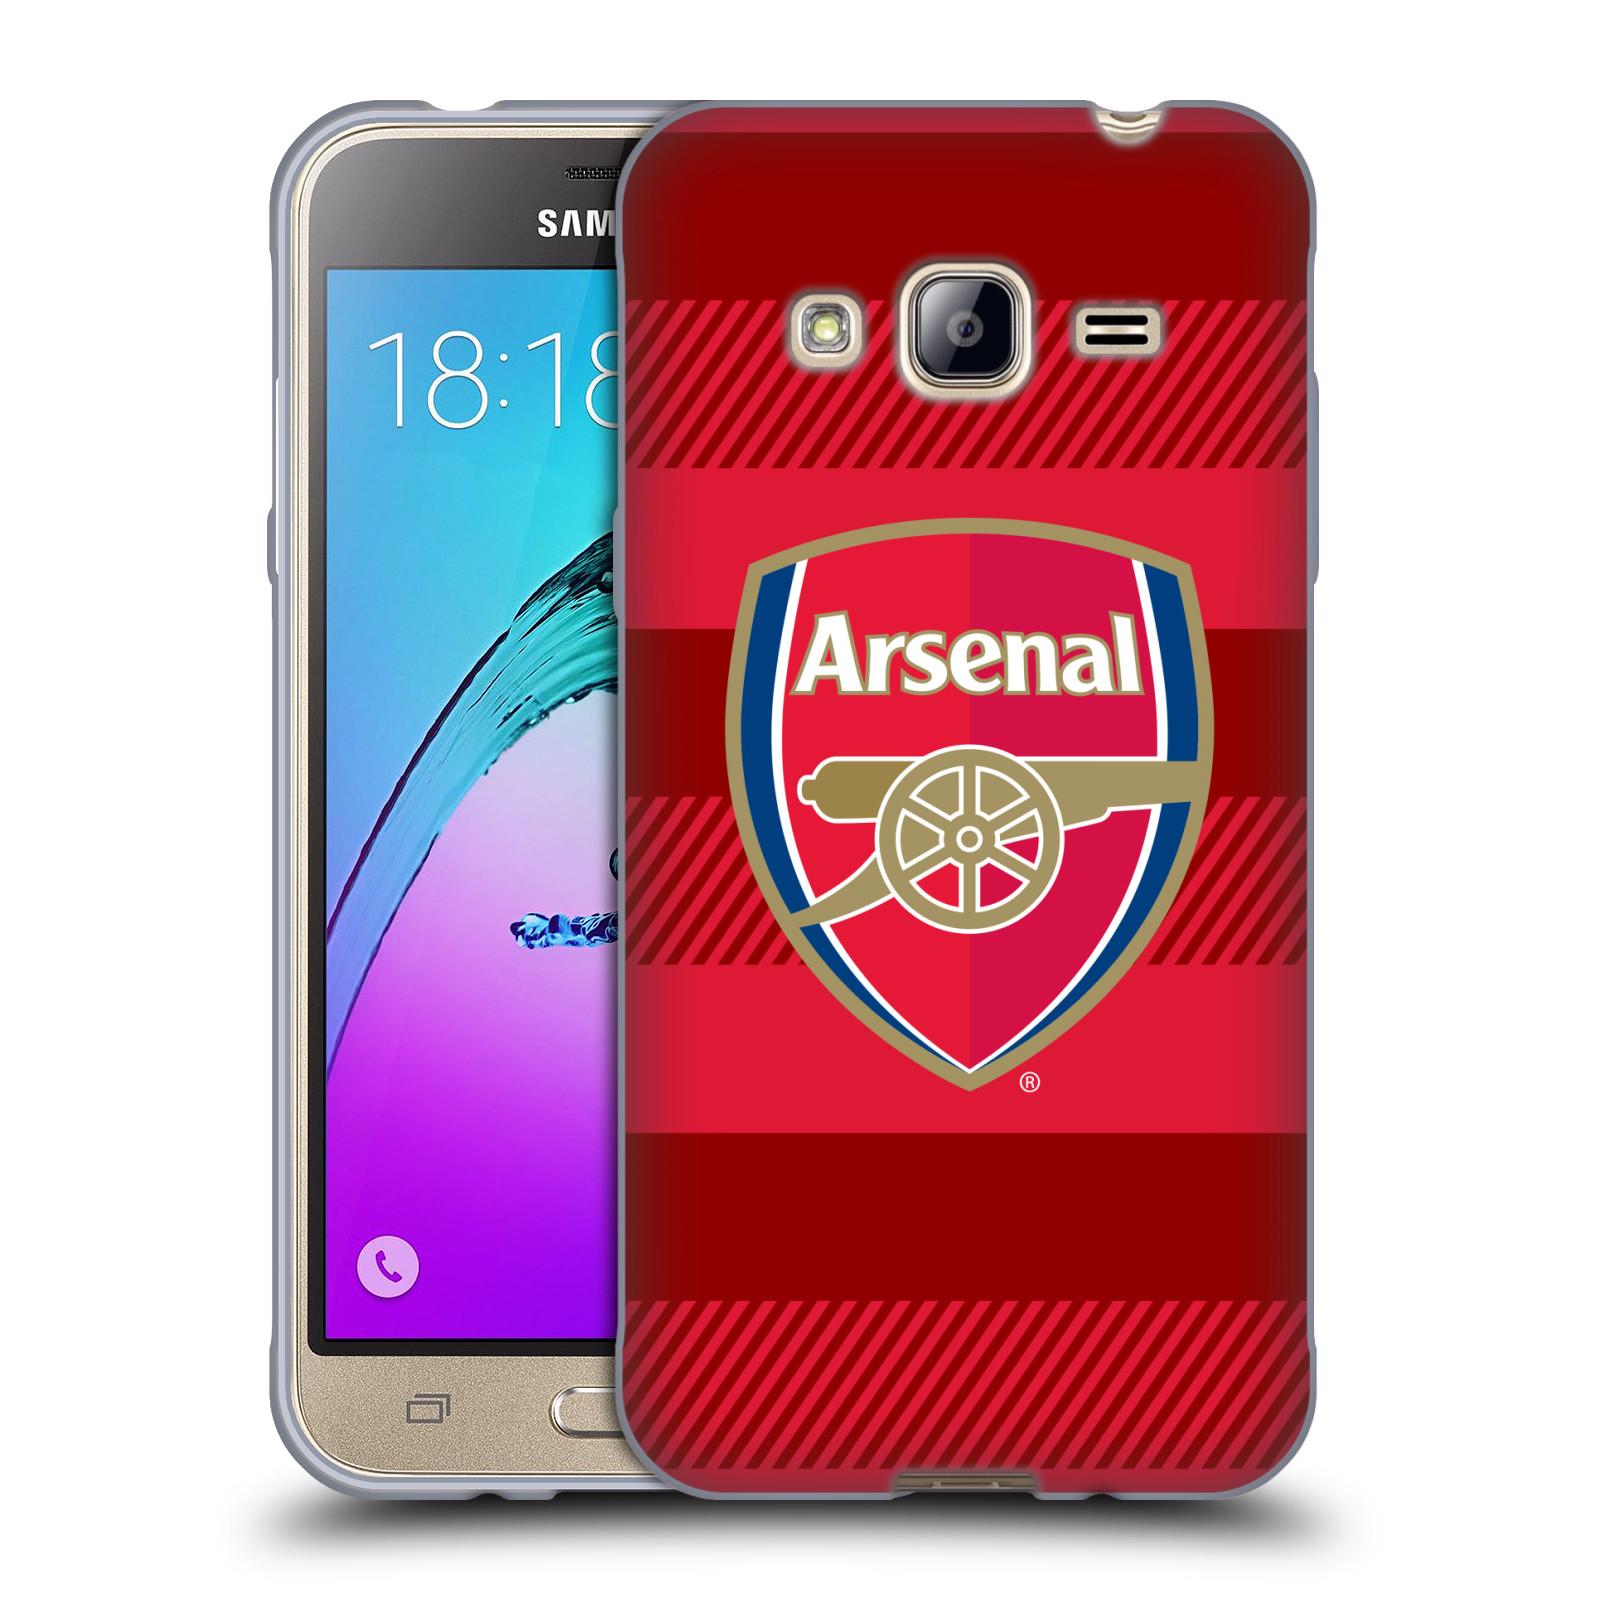 Silikonové pouzdro na mobil Samsung Galaxy J3 (2016) - Head Case - Arsenal FC - Logo s pruhy